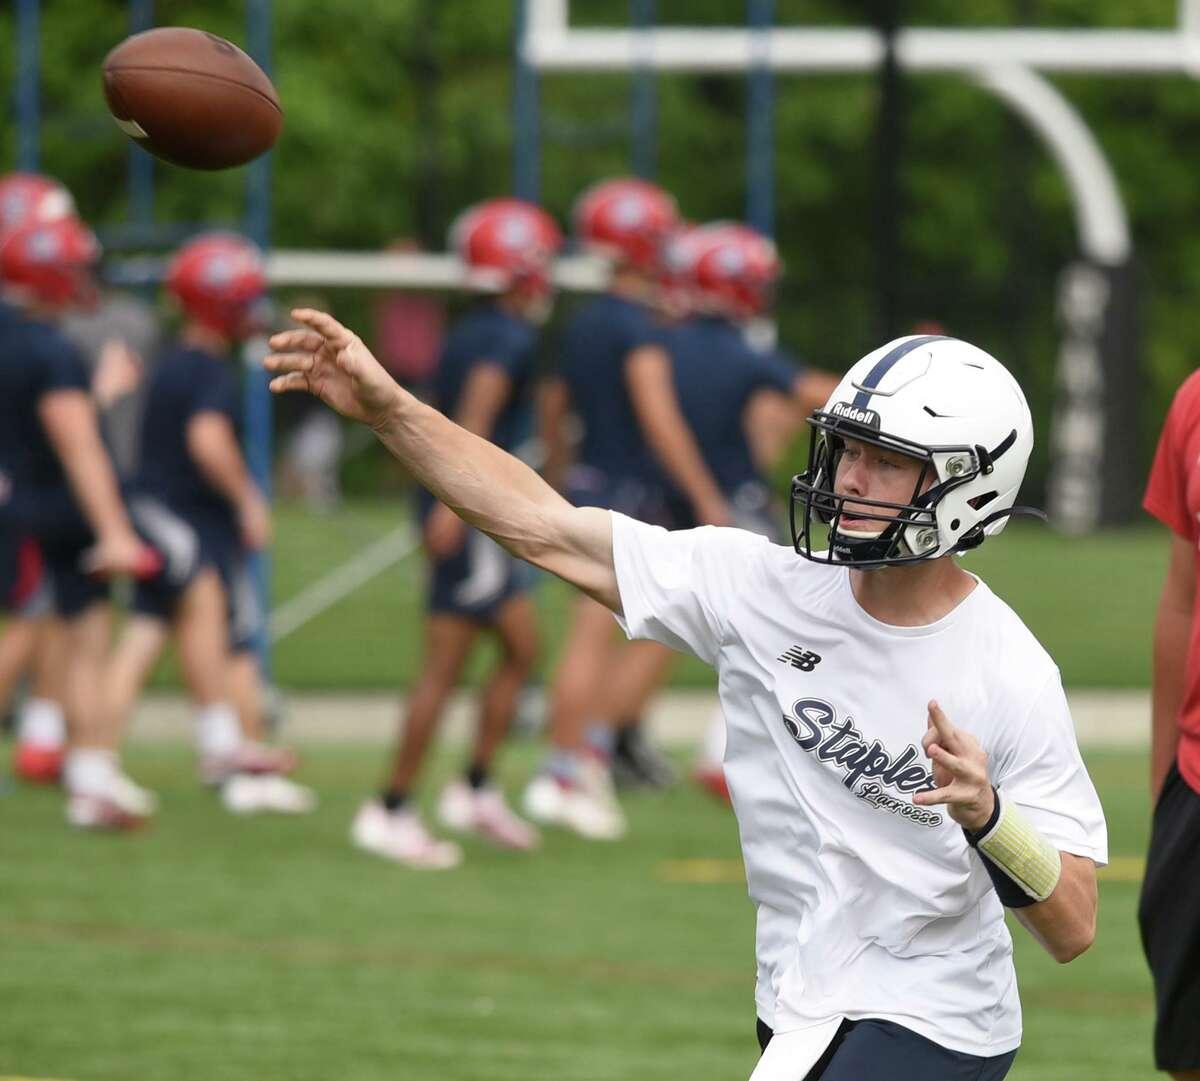 Staples' quarterback Ryan Thompson.